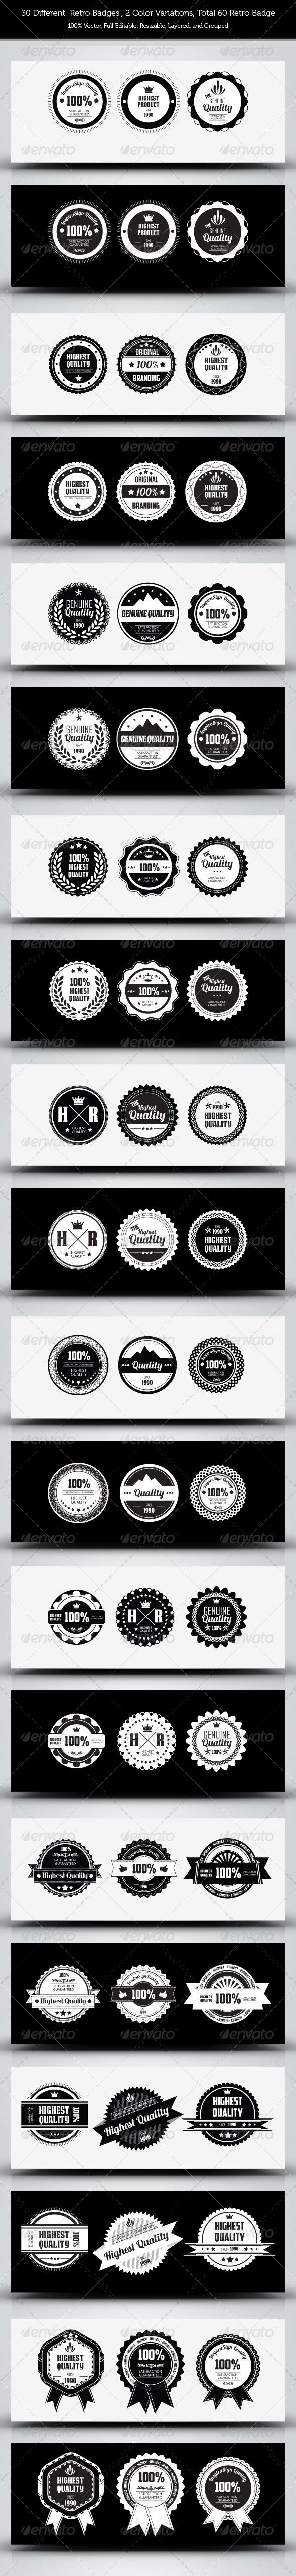 30 Genuine Quality - Retro Badges - Web Elements Vectors